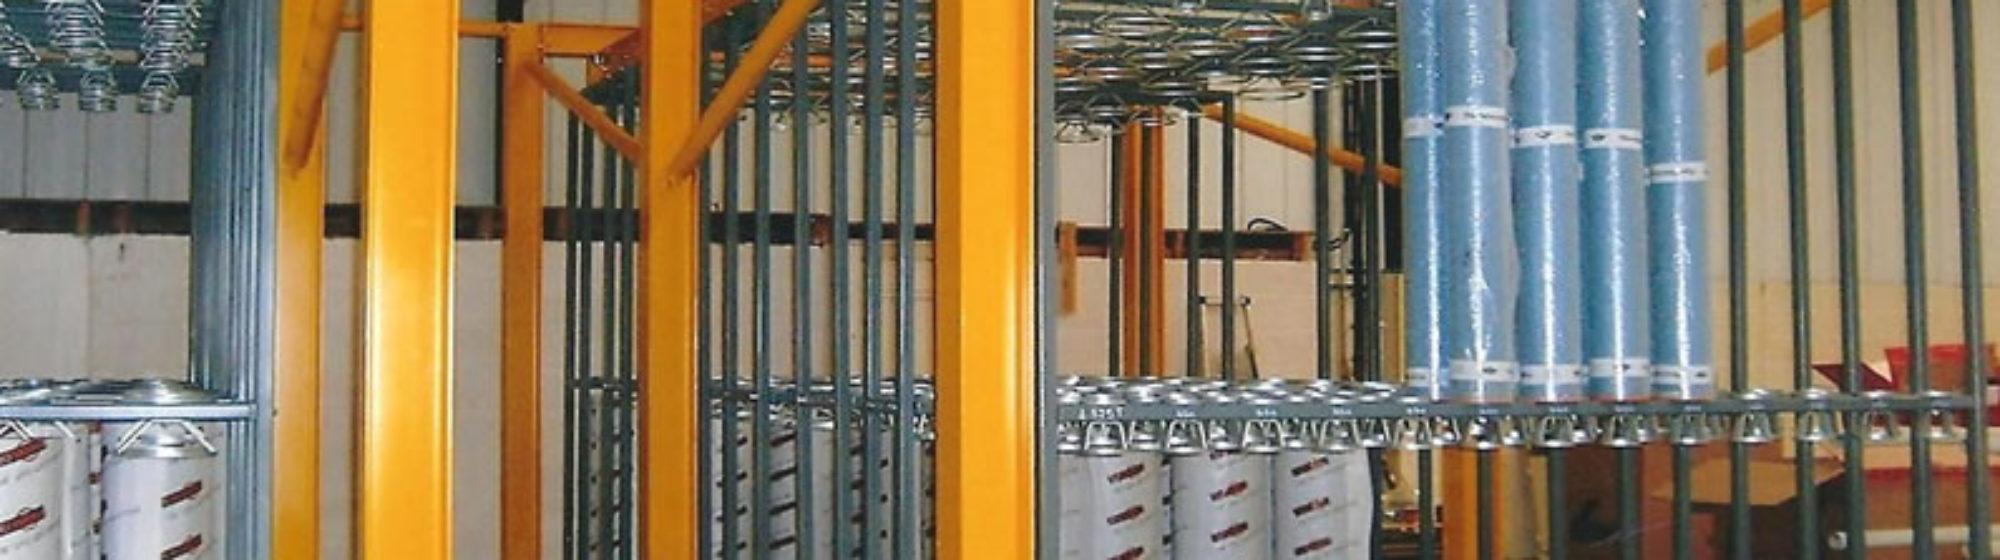 Print-Sleeve-Storage-Systems